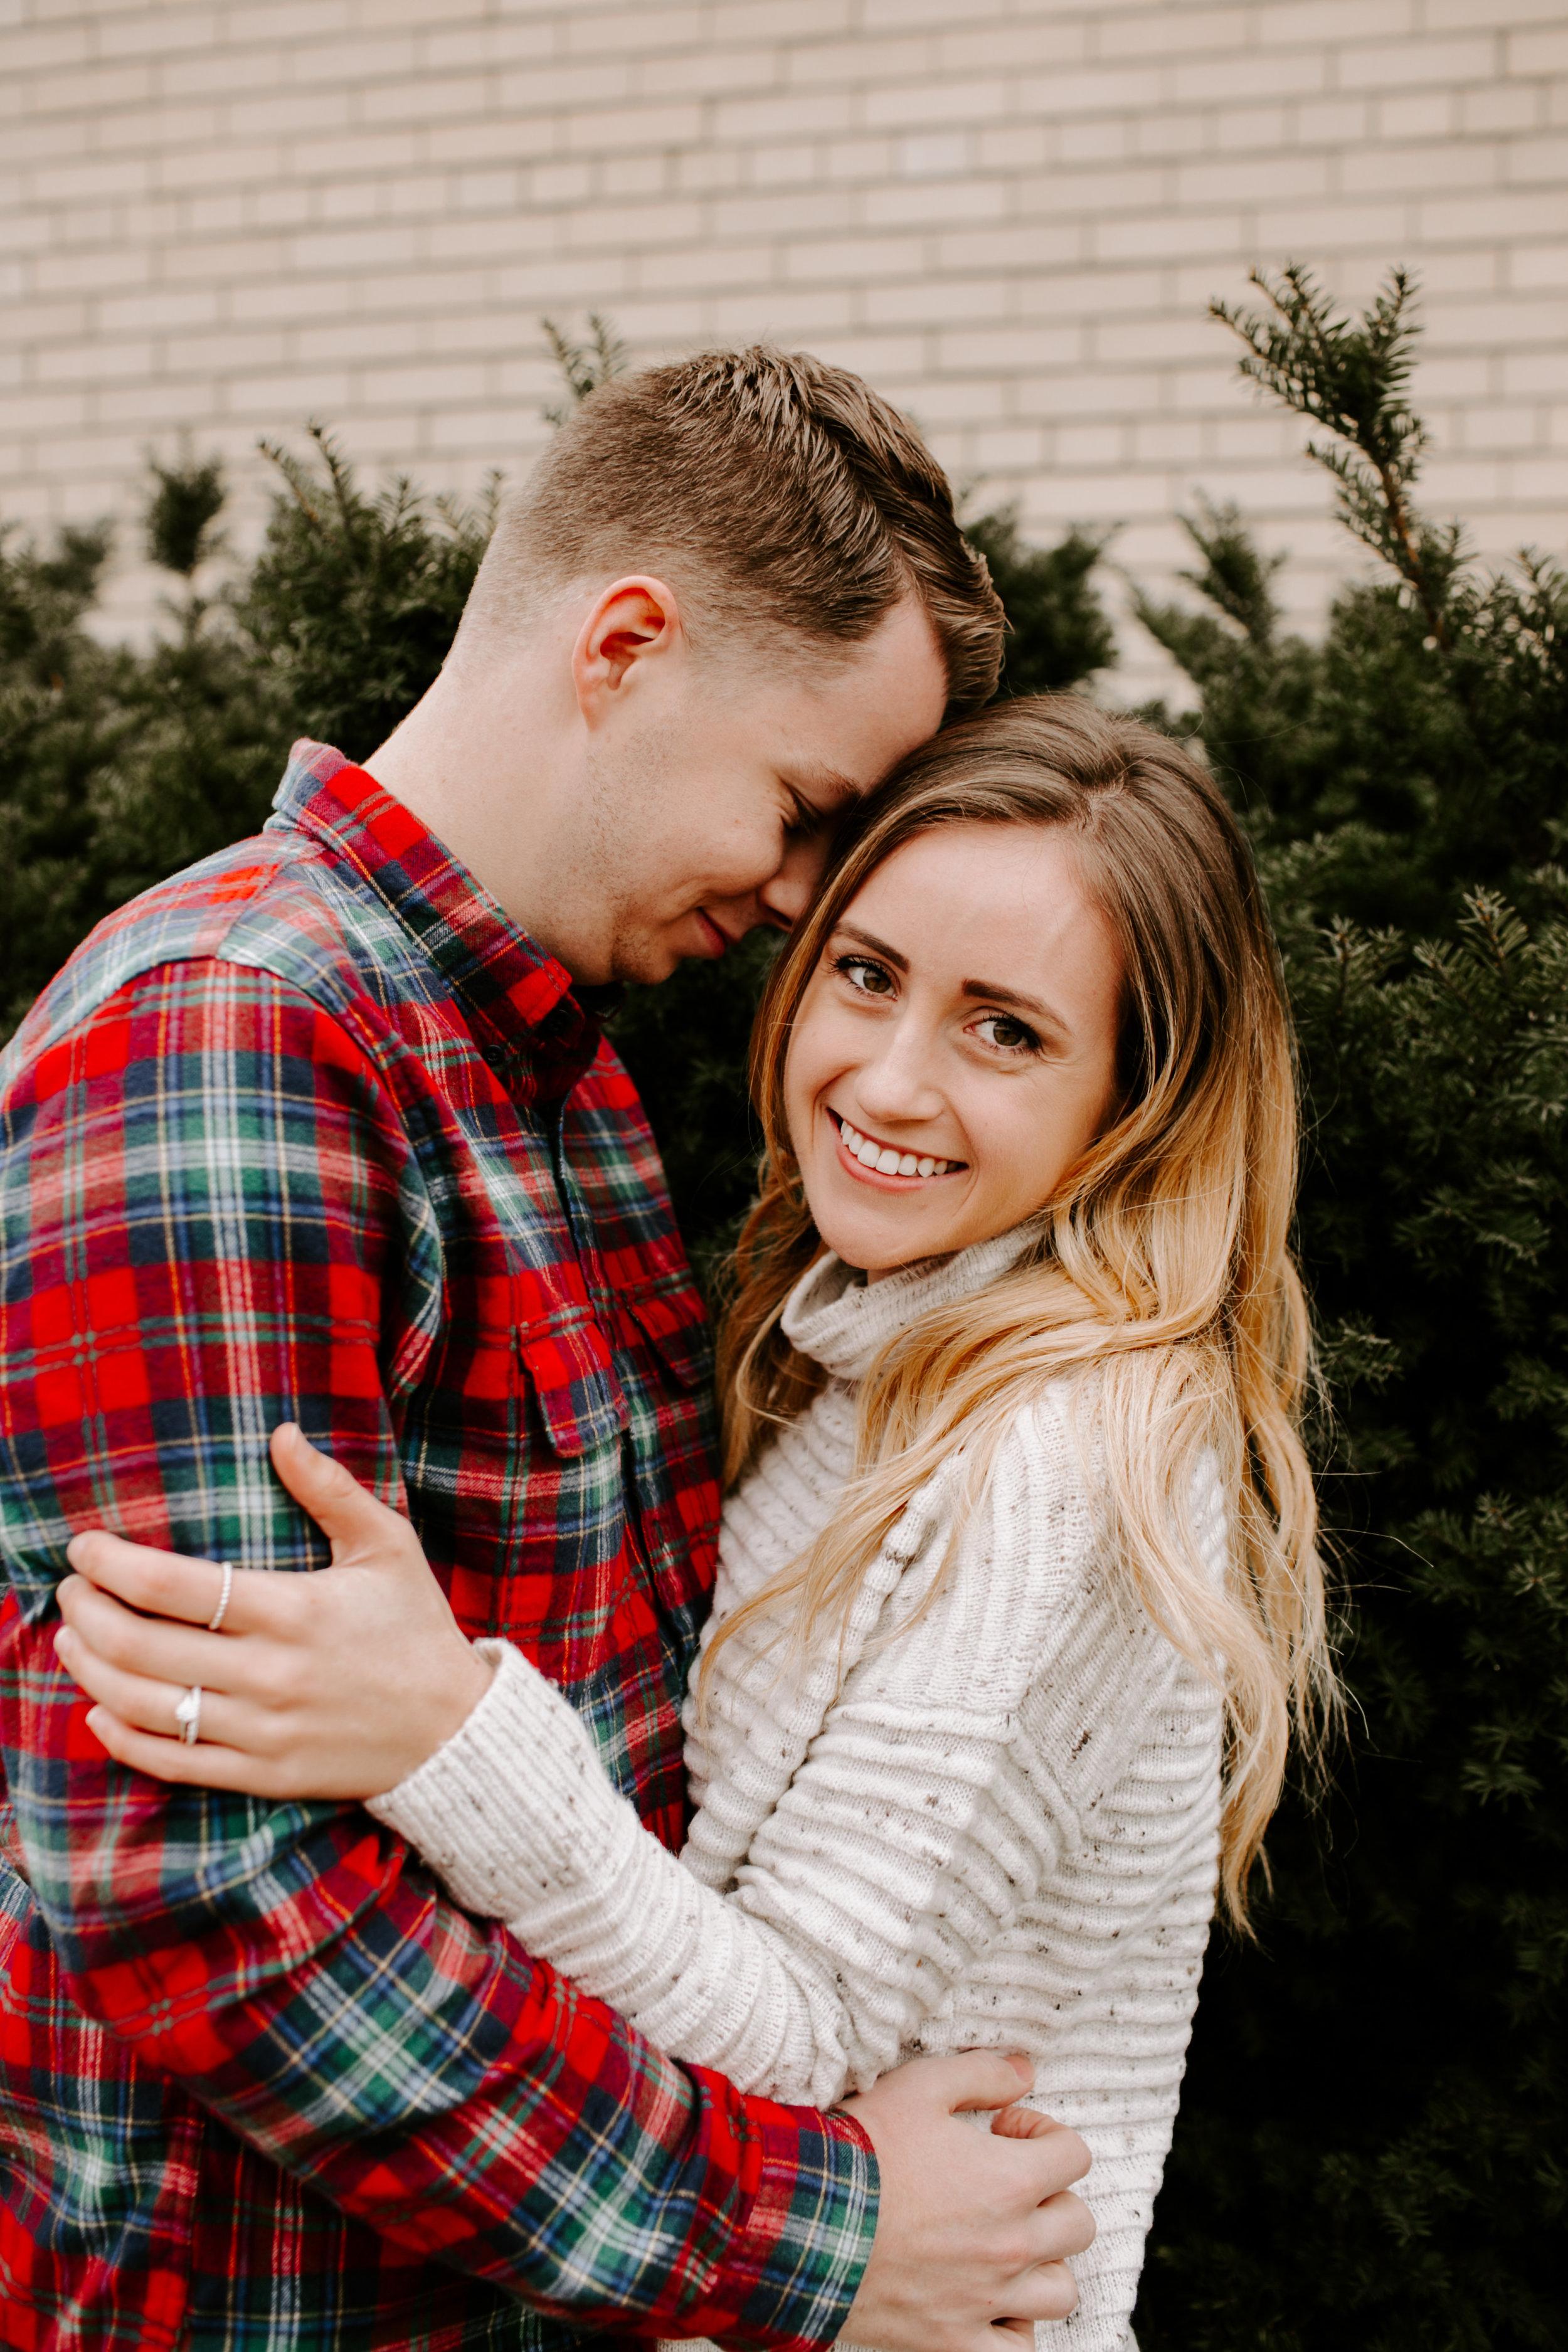 Hallie and Tyler Couple Photos downtown Broad Ripple Indiana Emily Elyse Wehner Photography LLC-19.jpg